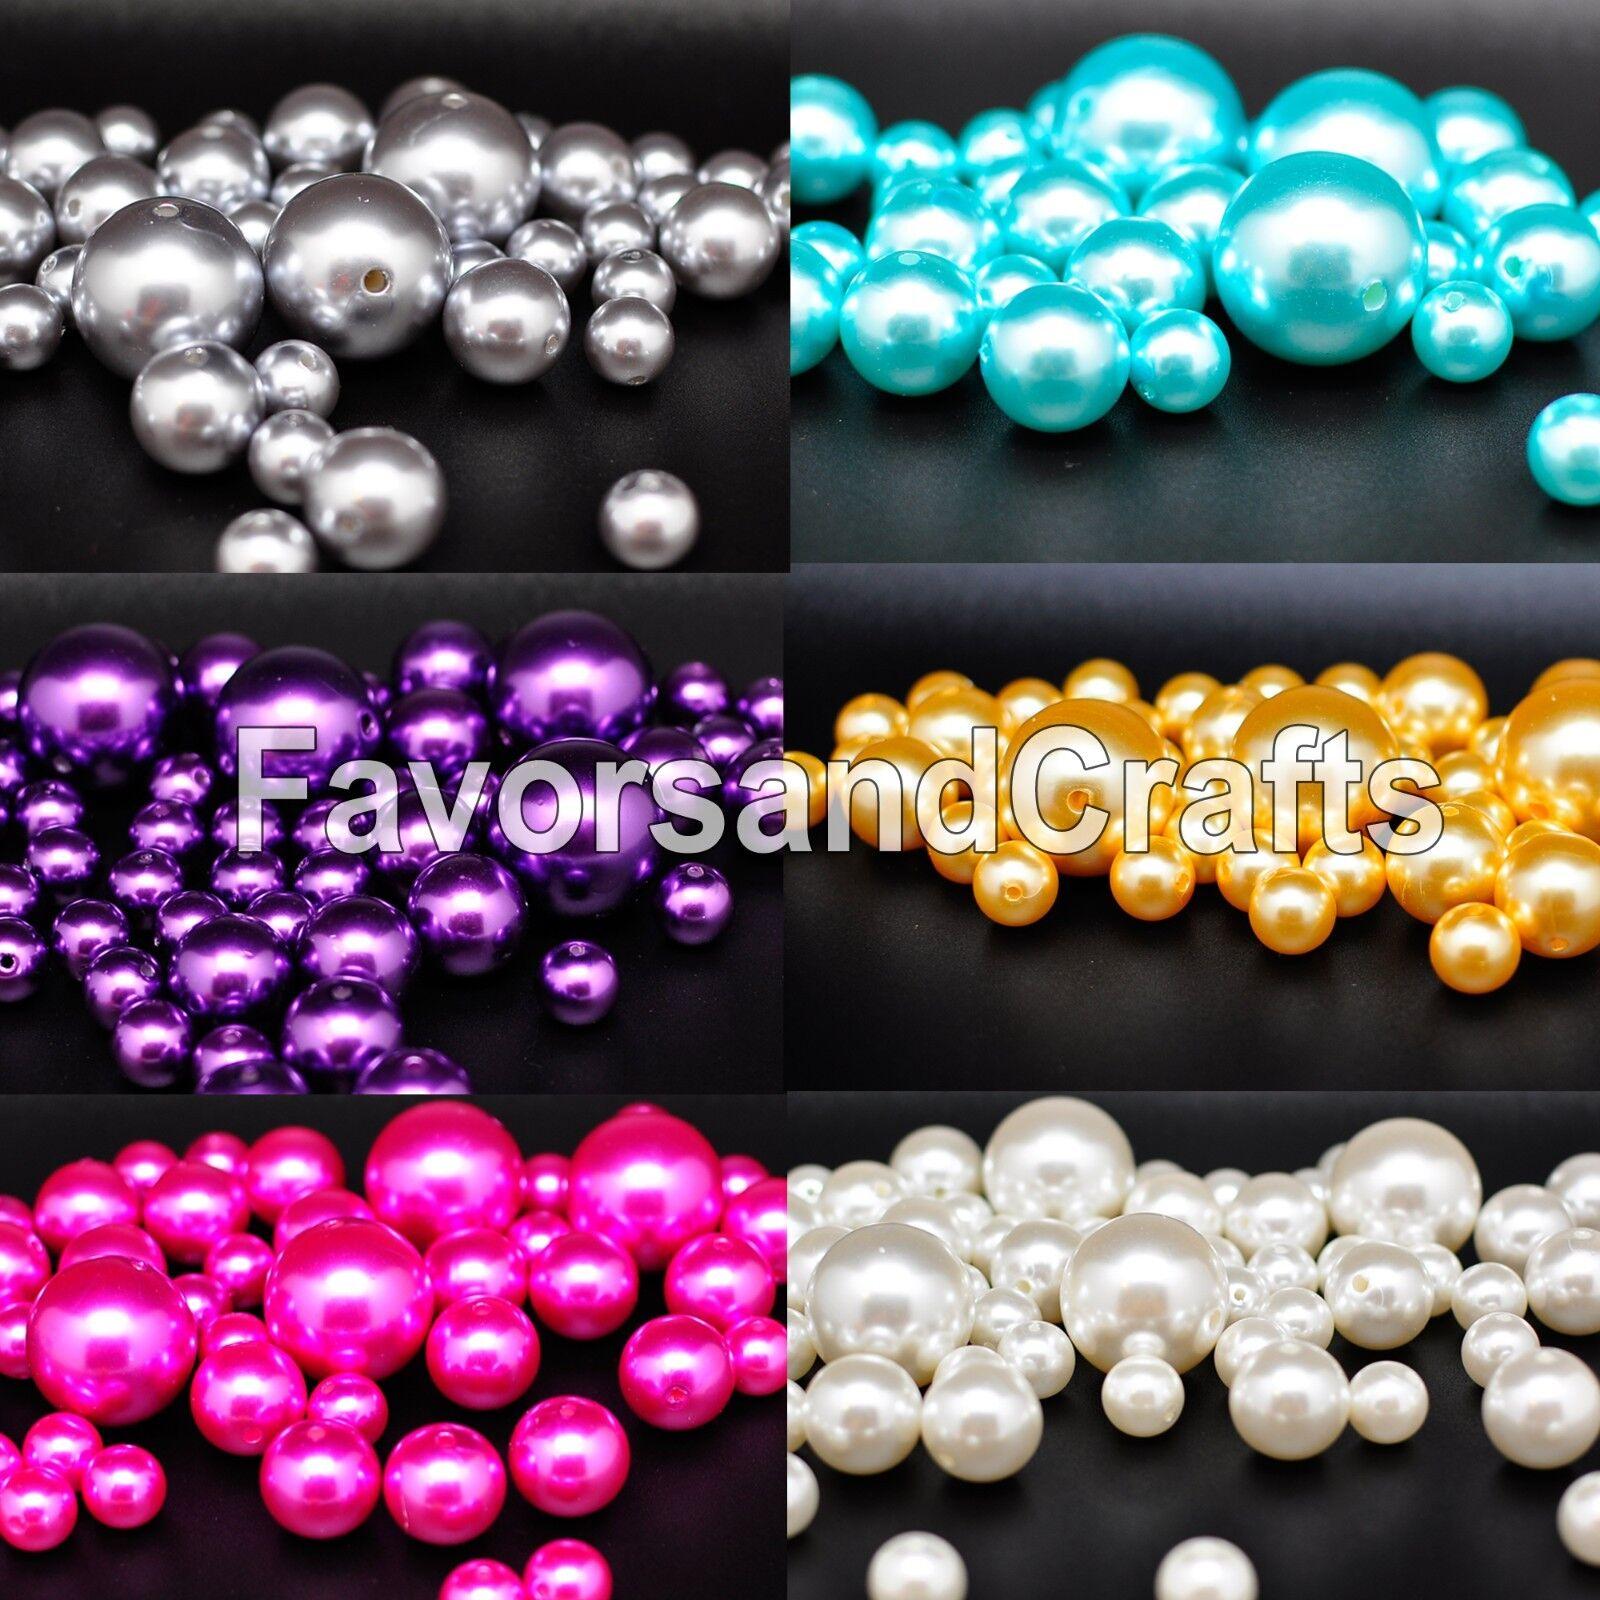 76 Pearl Vase Fillers Balls Clear Pink Gems Gold Decorative